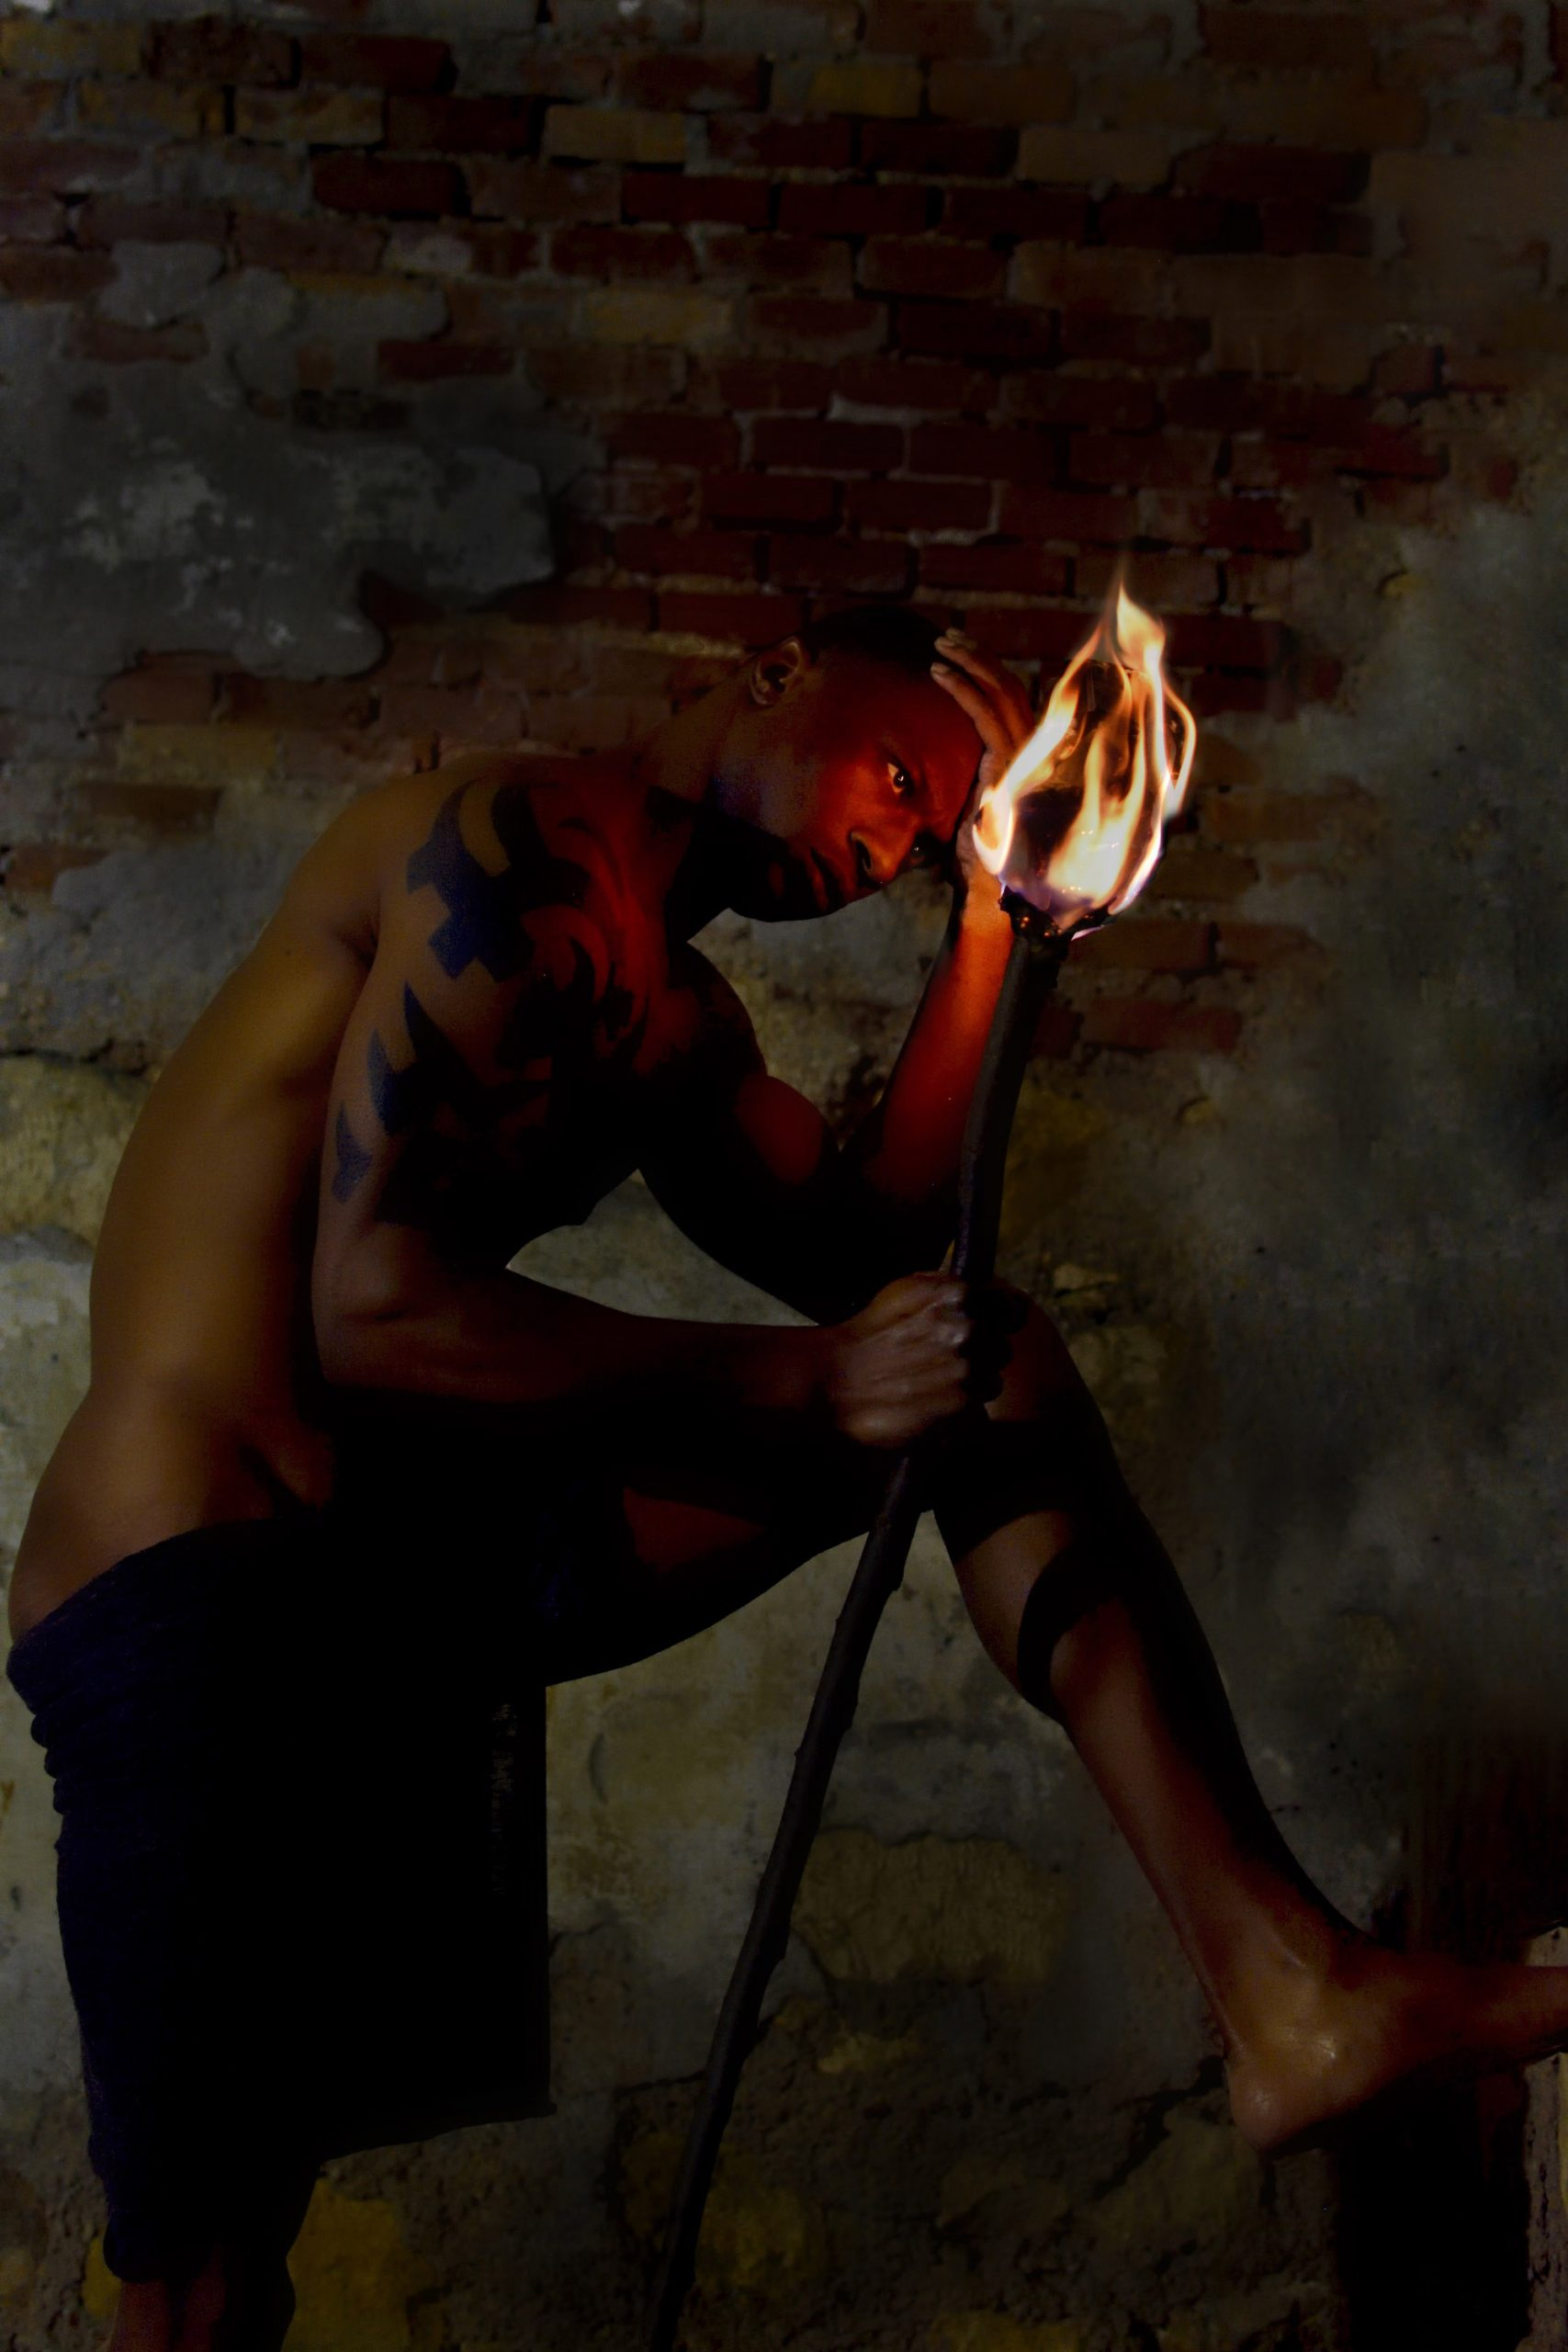 Categorie: Boudoir & Nude, Portrait - Photographer: ROSY CARLETTI - Model: MICHAEL J. OBETEN - Location: Verona, VR, Italia